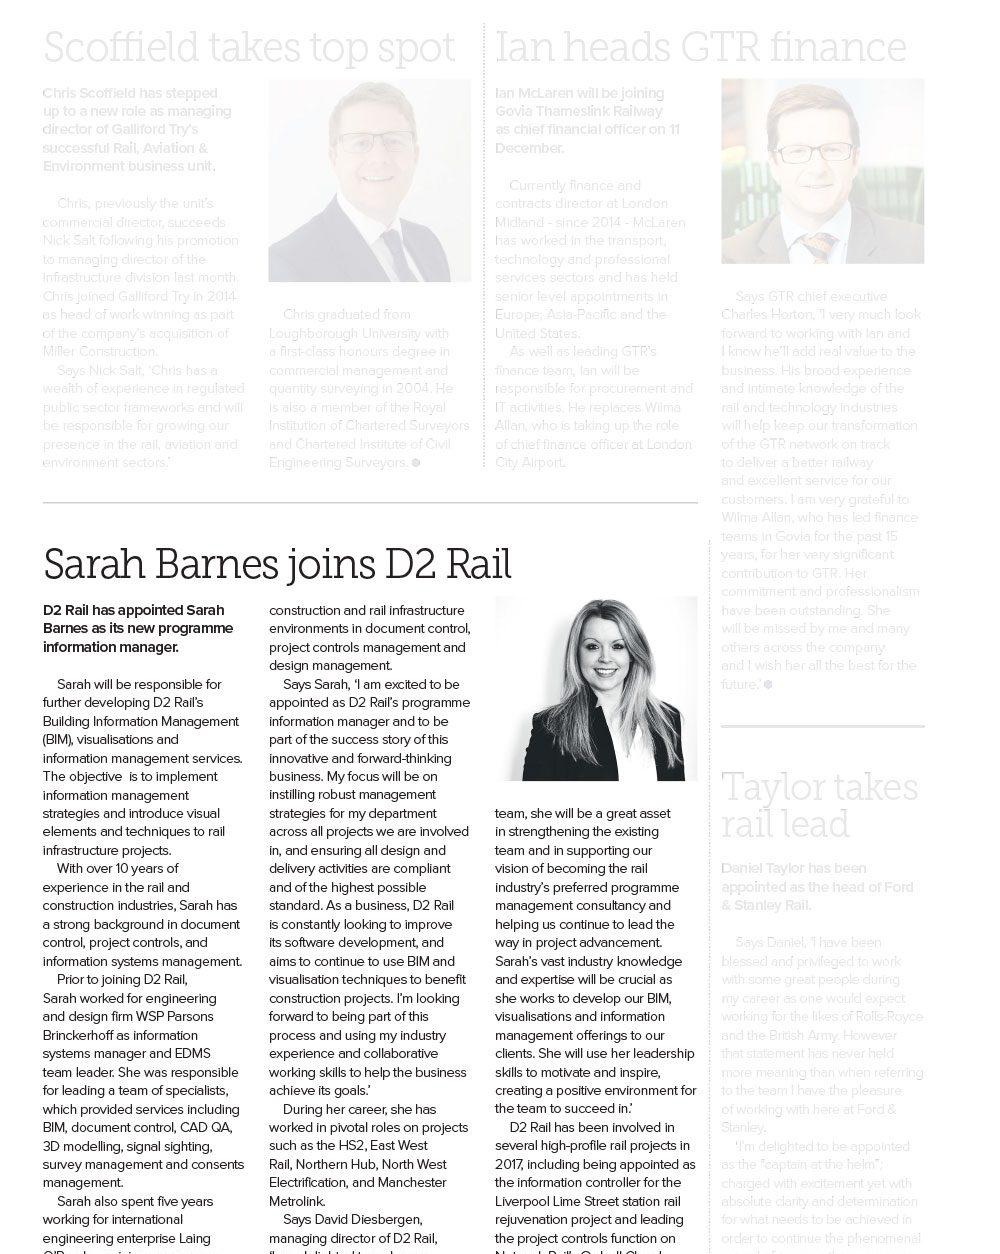 Sarah Barnes joins D2 Rail in Information Management